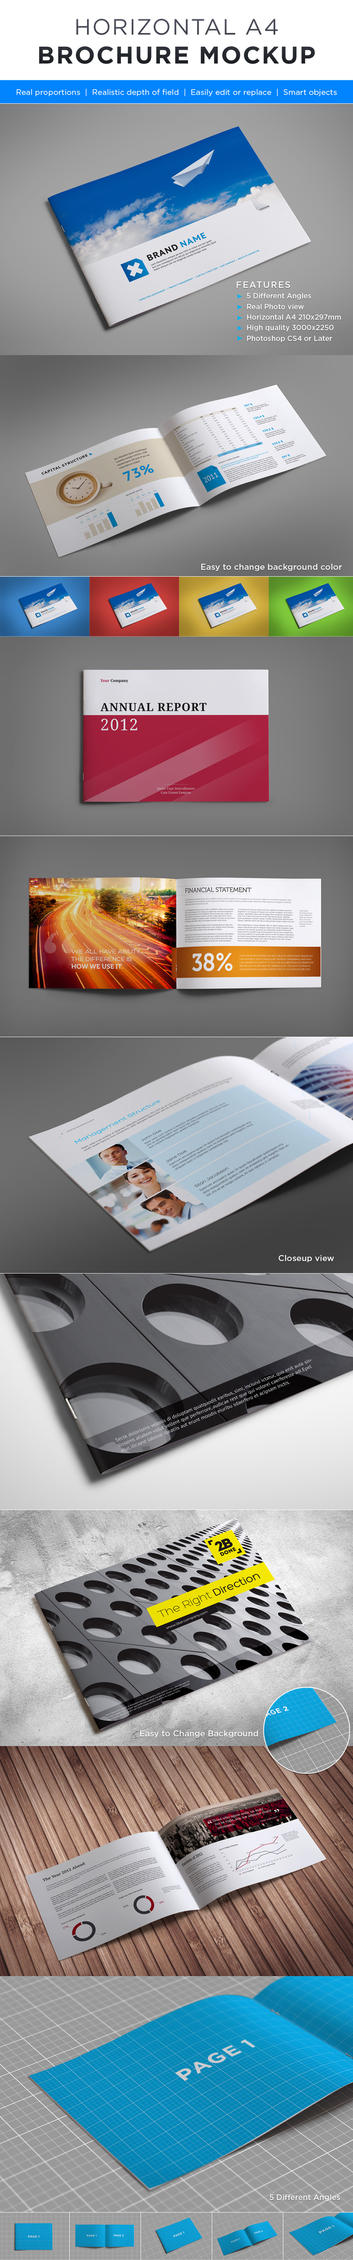 horizontal brochure design - horizontal brochure mock up by genetic96 on deviantart